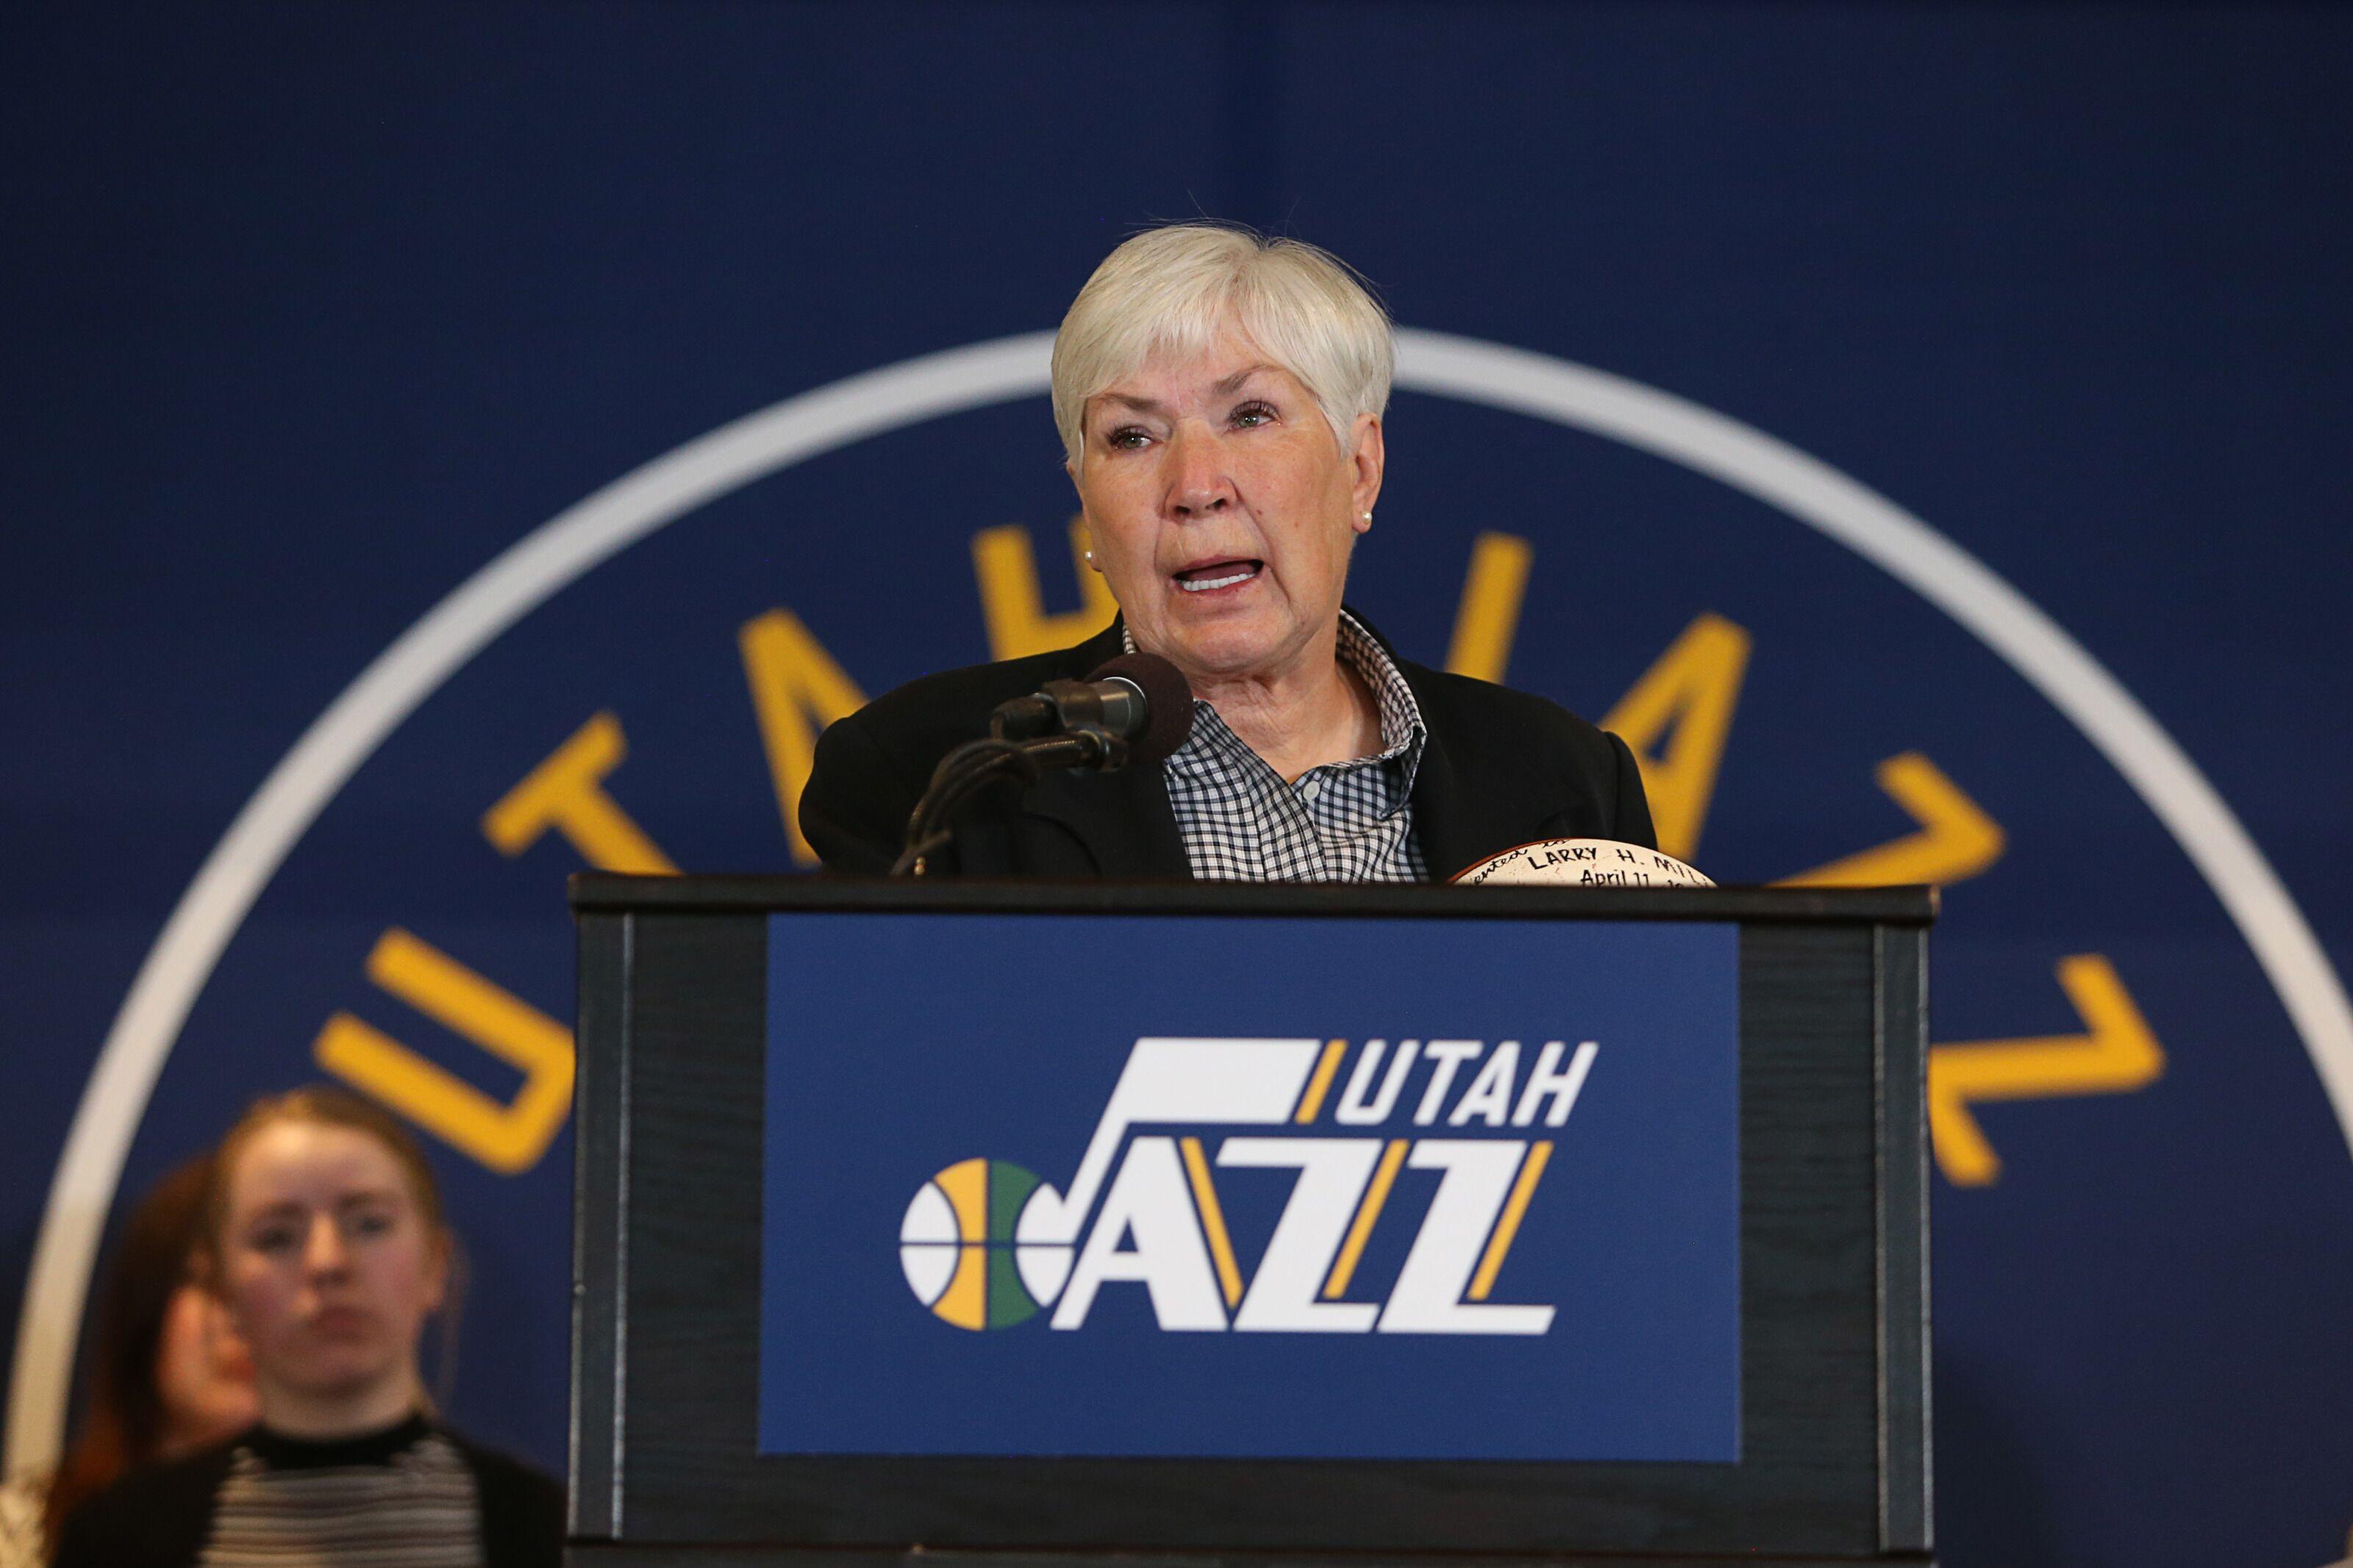 Utah Jazz owner Gail Miller has her sights set firmly on championship